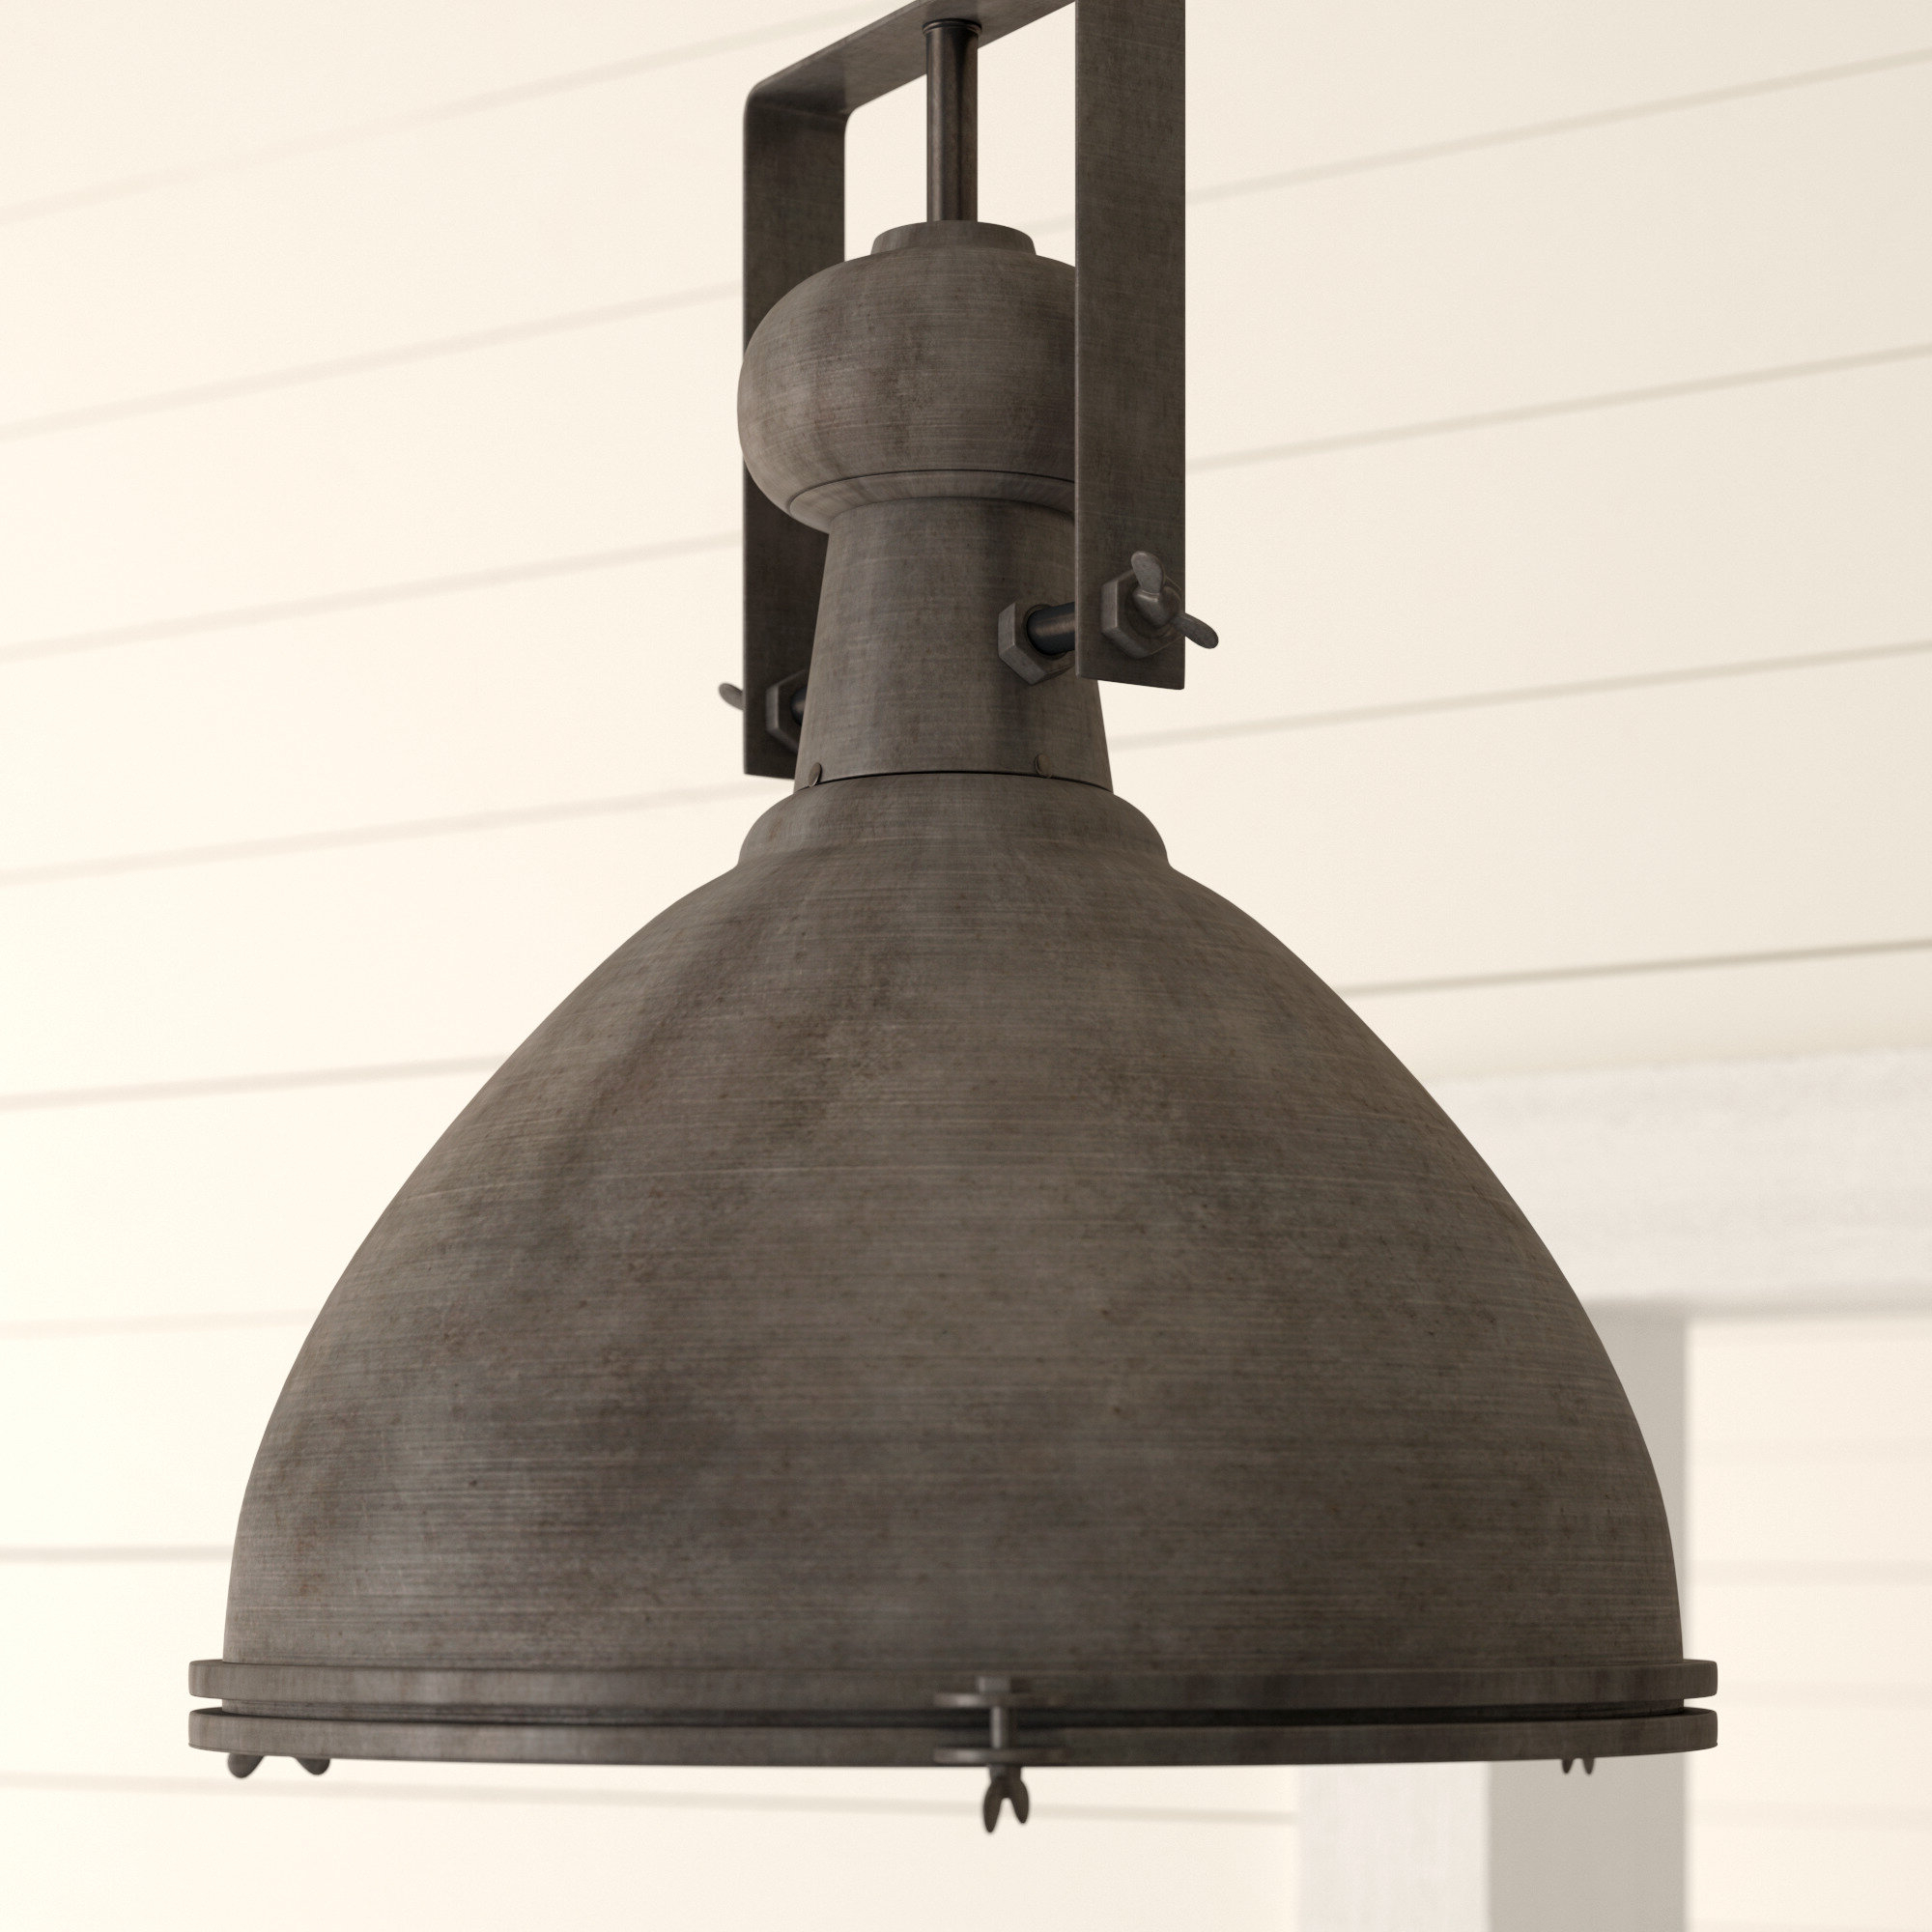 Newest Hamilton 1 Light Single Dome Pendants In 17 Stories Lavern 1 Light Single Dome Pendant (View 24 of 25)